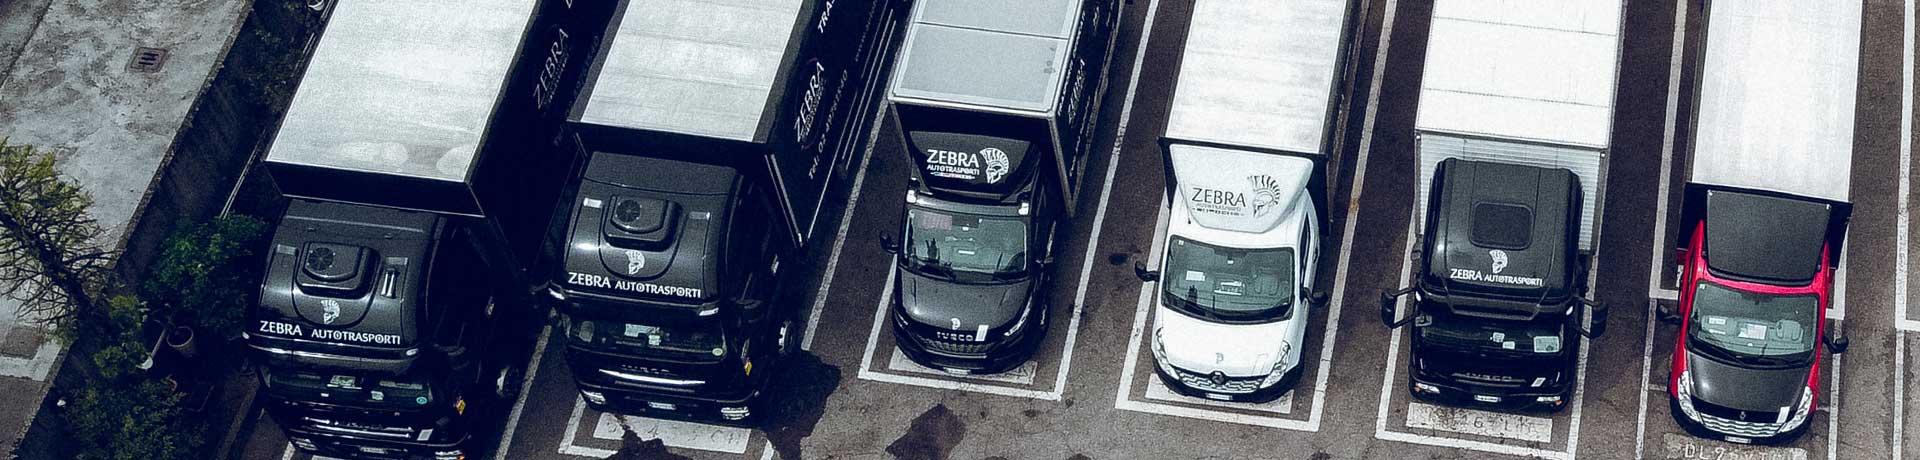 preventivo trasporto autotrasporti zebra